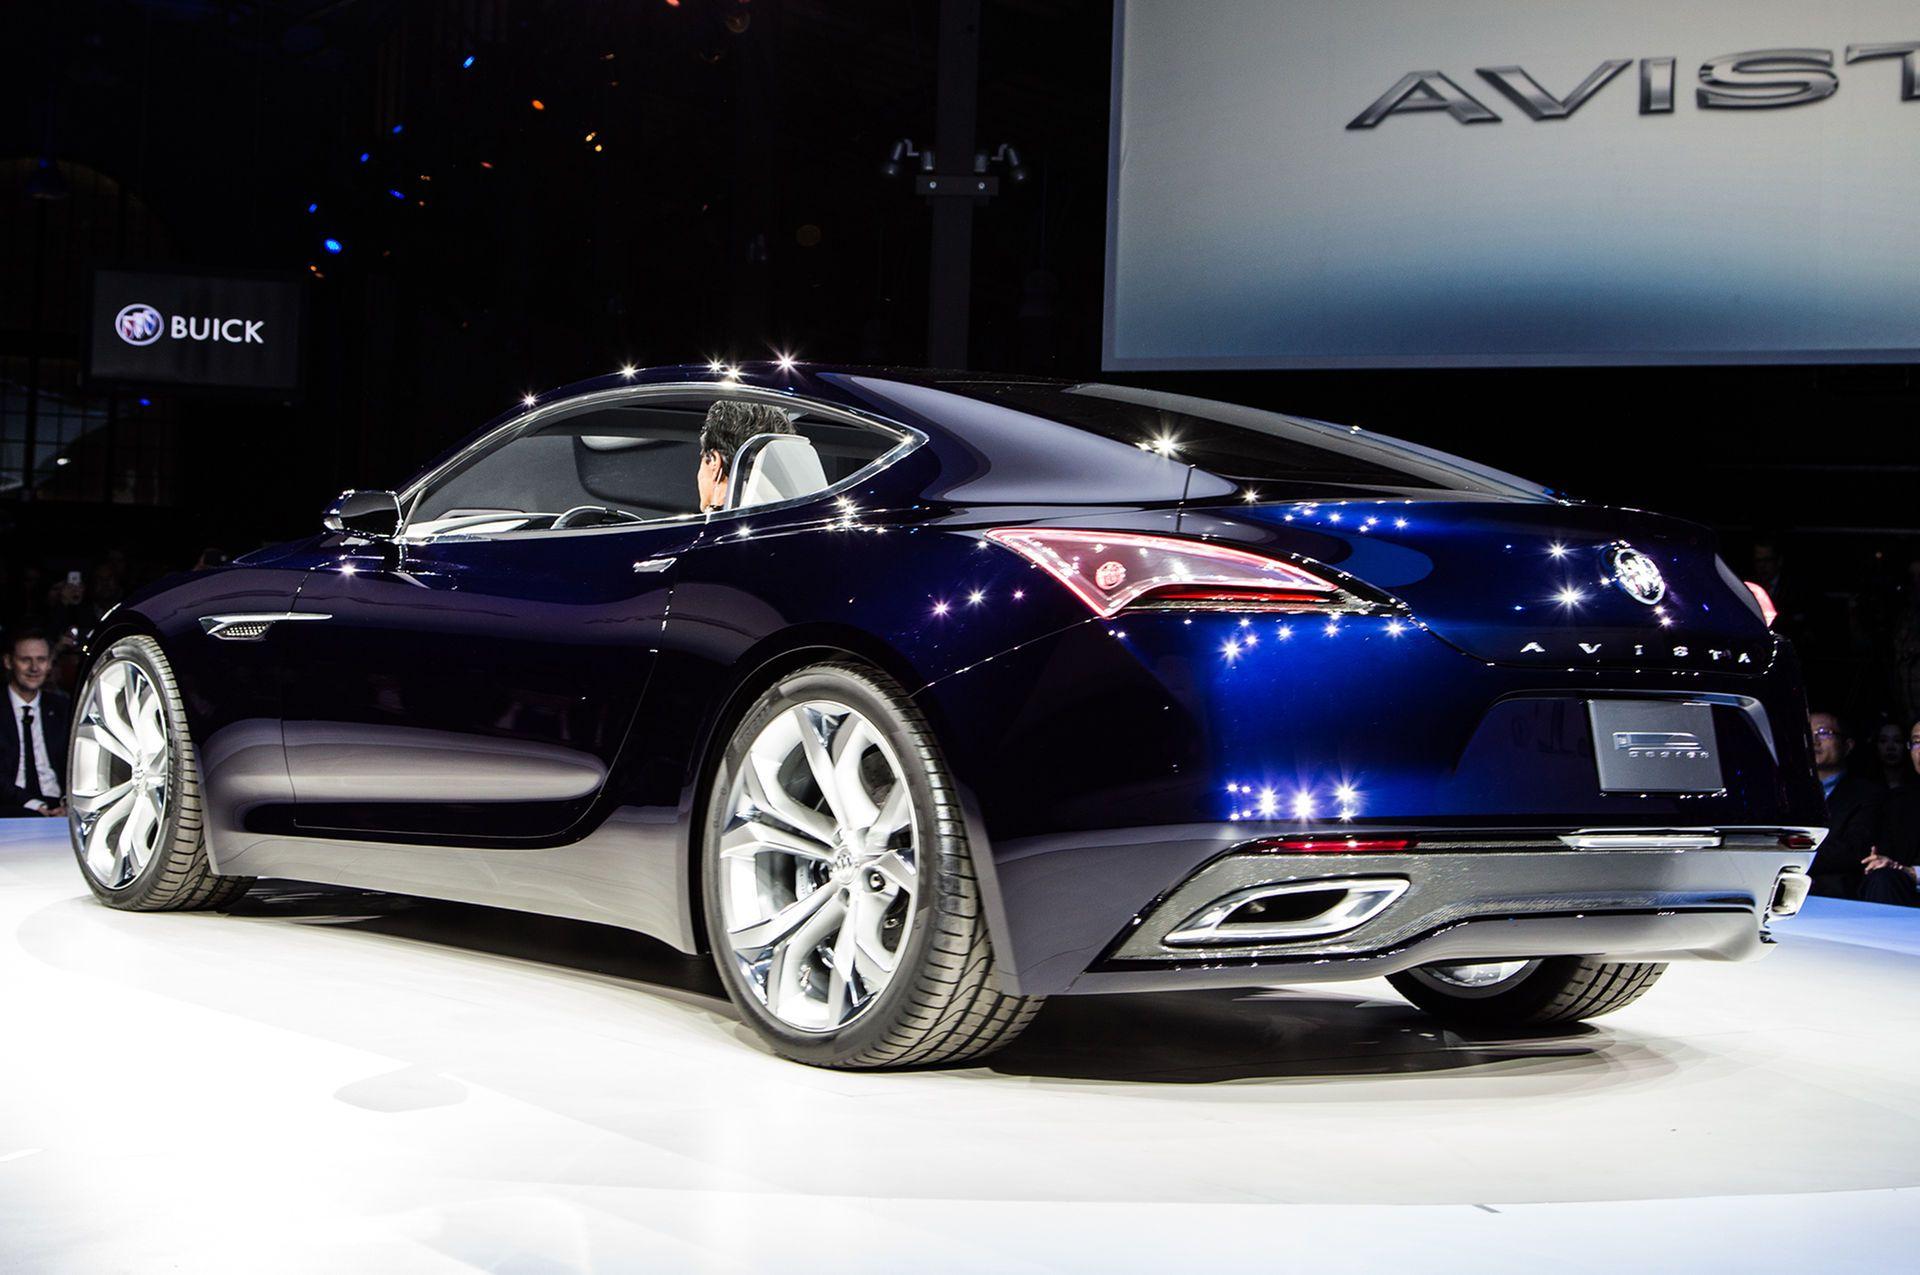 400 Hp Buick Avista Concept Debuts Ahead Of Detroit Show Buick Avista Buick Sport Cars